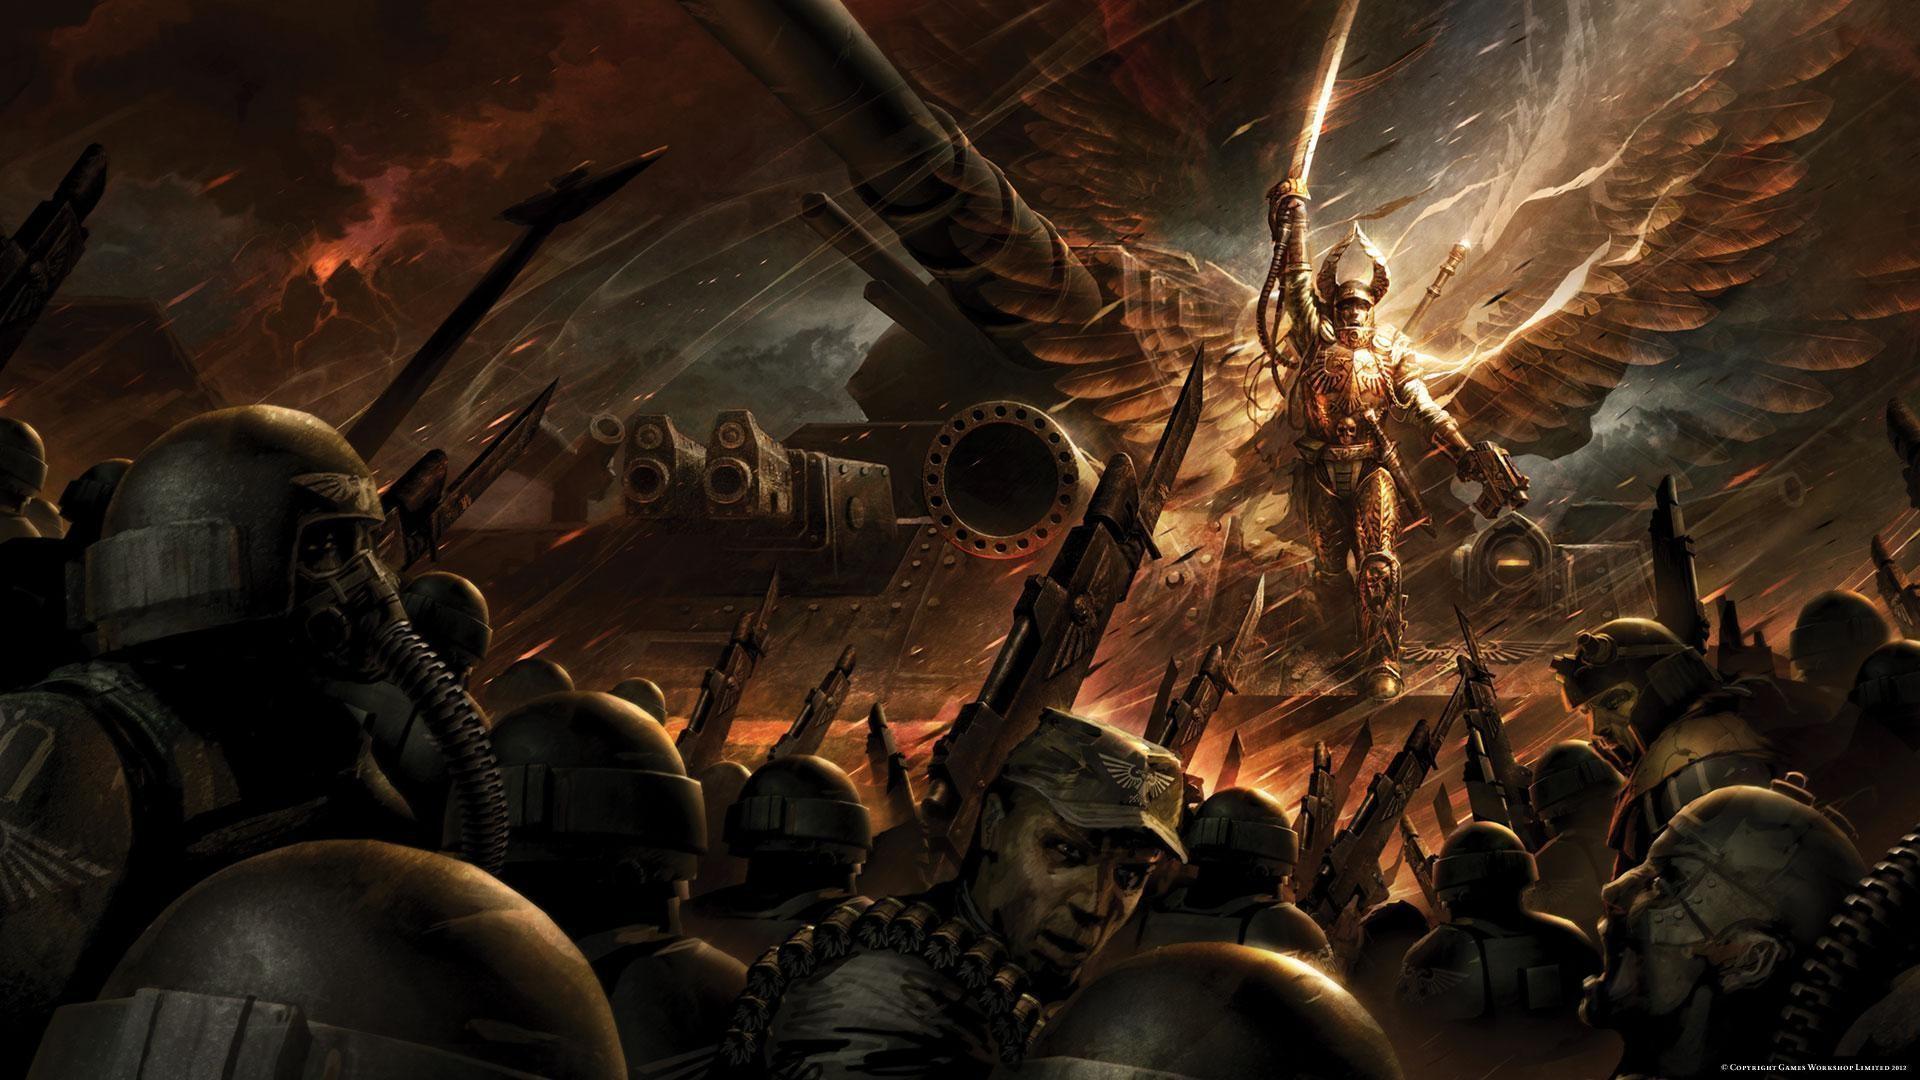 General 1920x1080 Warhammer 40,000 imperial guard wings fantasy art artwork soldier weapon war 2012 (Year)